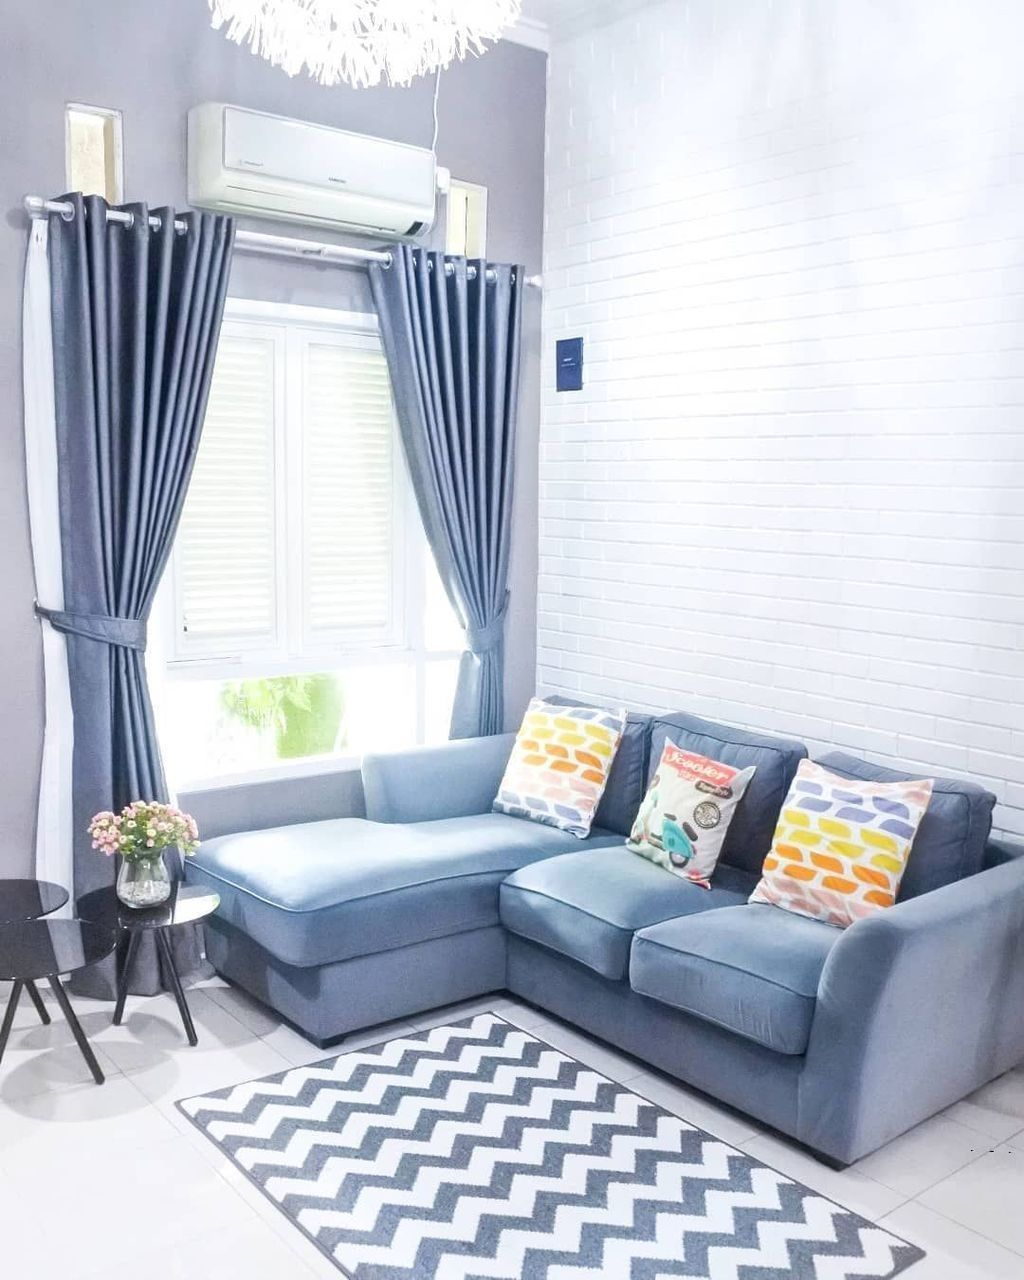 Pin by KPR Academy on Nice Home  Minimalist living room